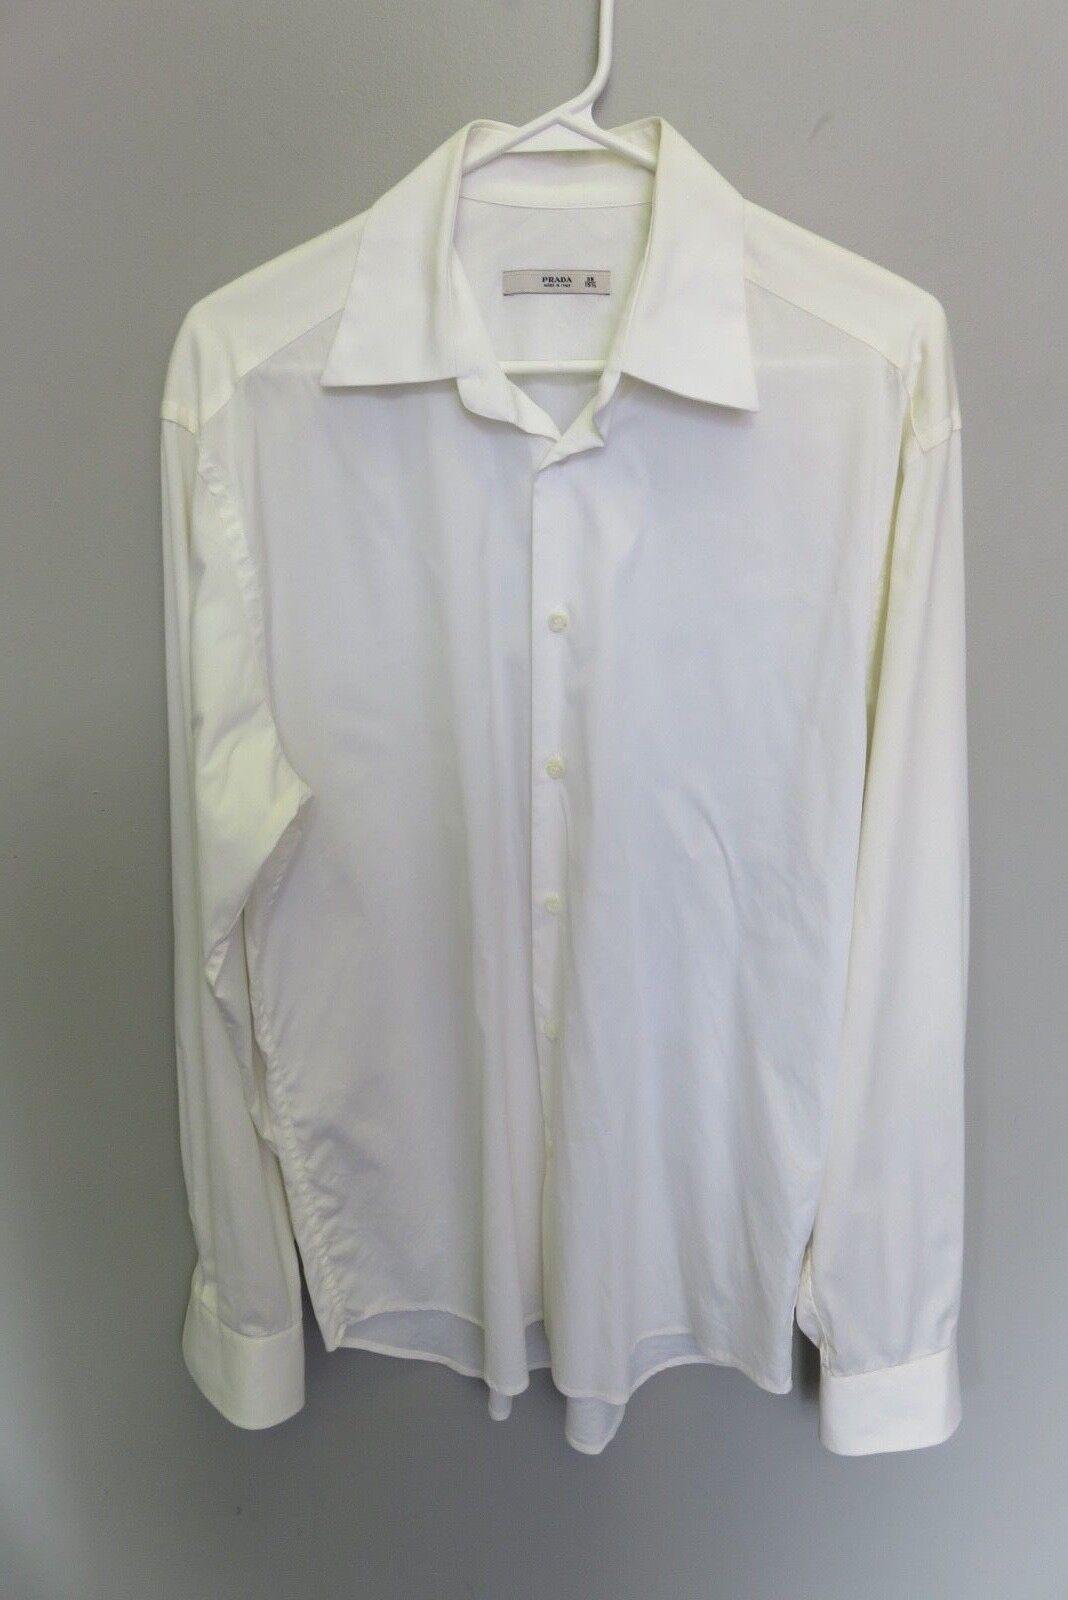 Prada men shirt size 39 15.5 cream or off white, regular cuff